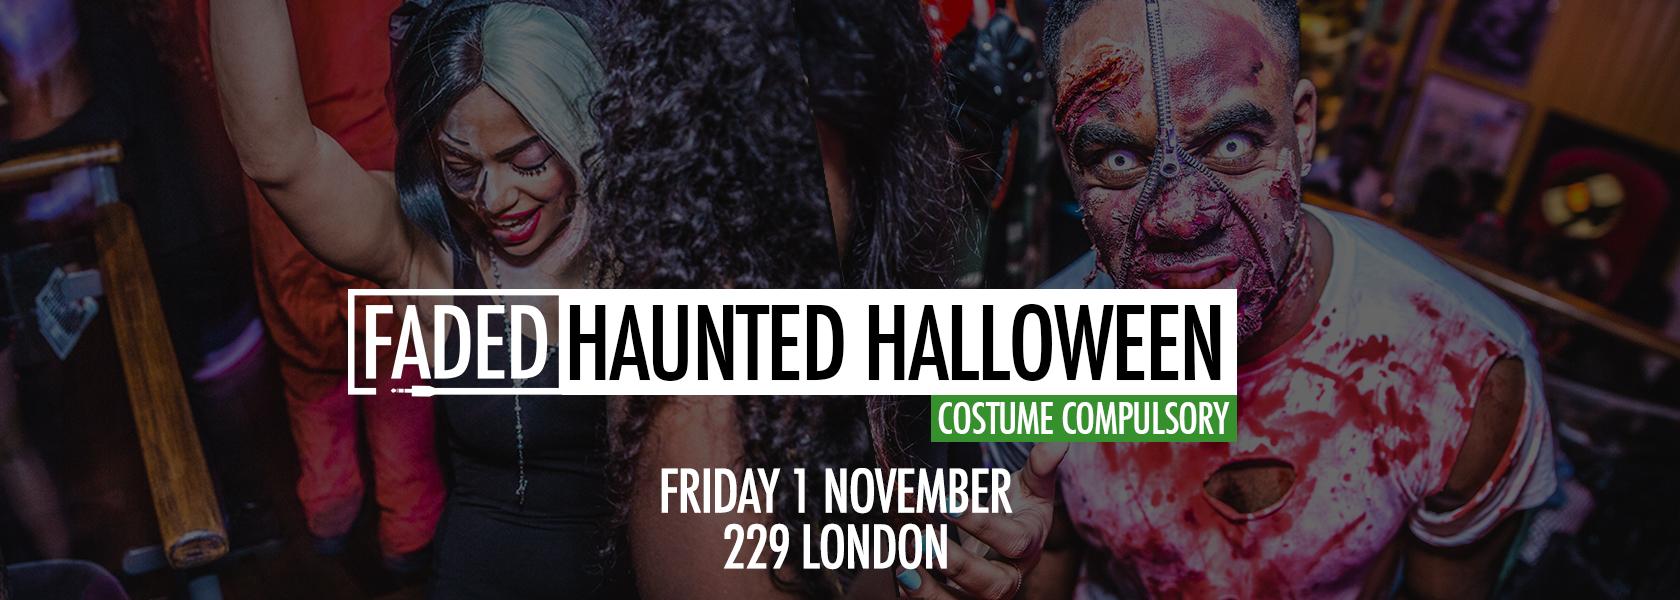 Halloween 1 November.Faded Haunted Halloween On Fri 1st Nov 2019 At 229 The